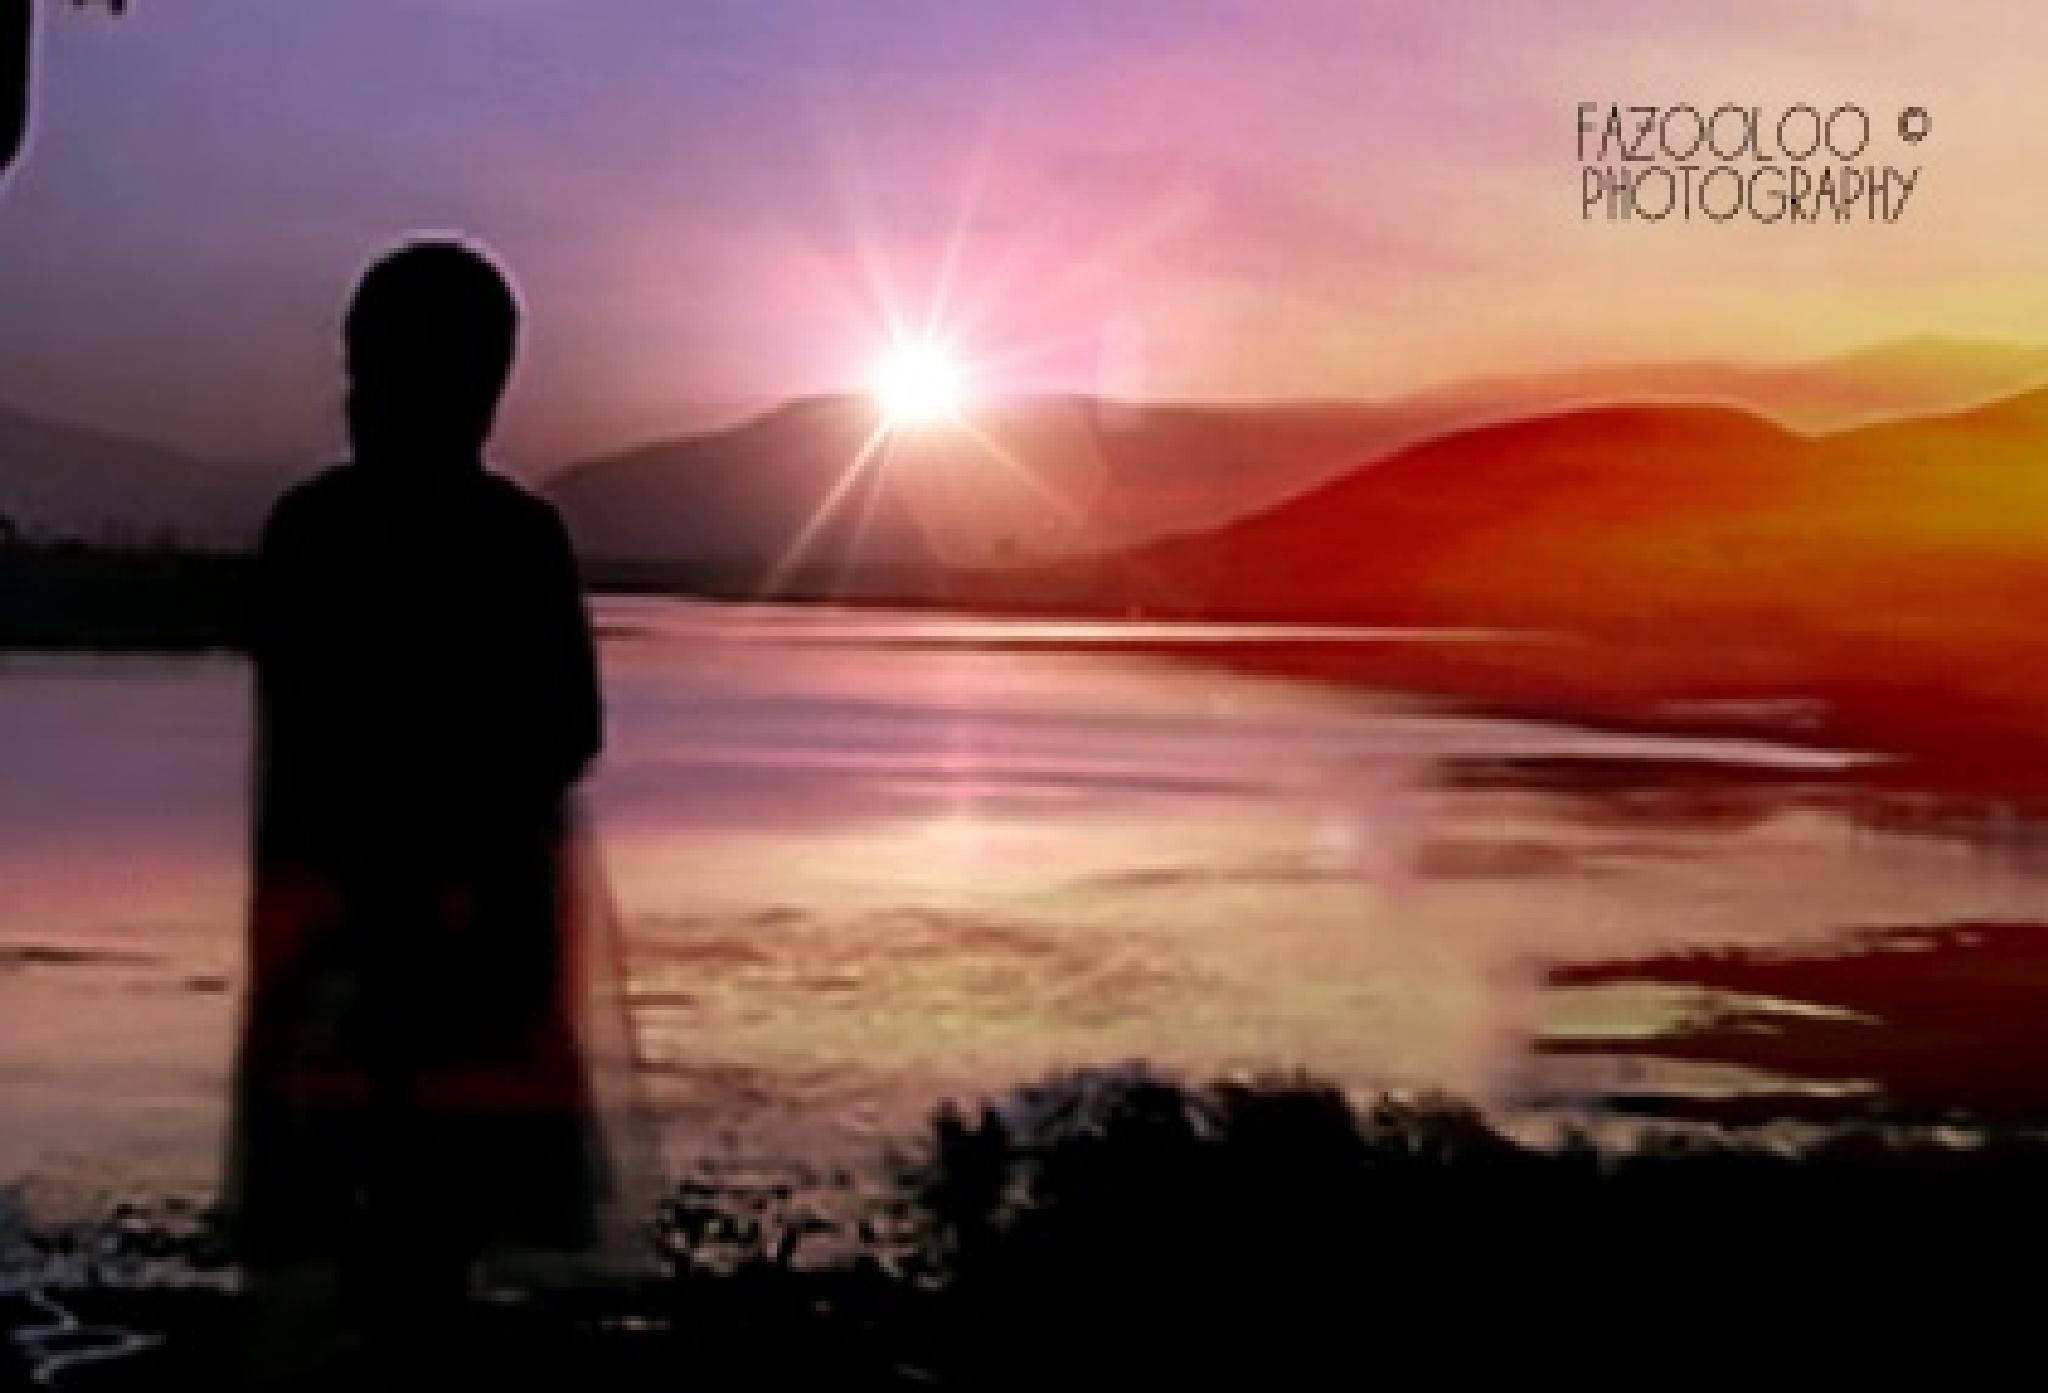 Sunrises by fazooloo